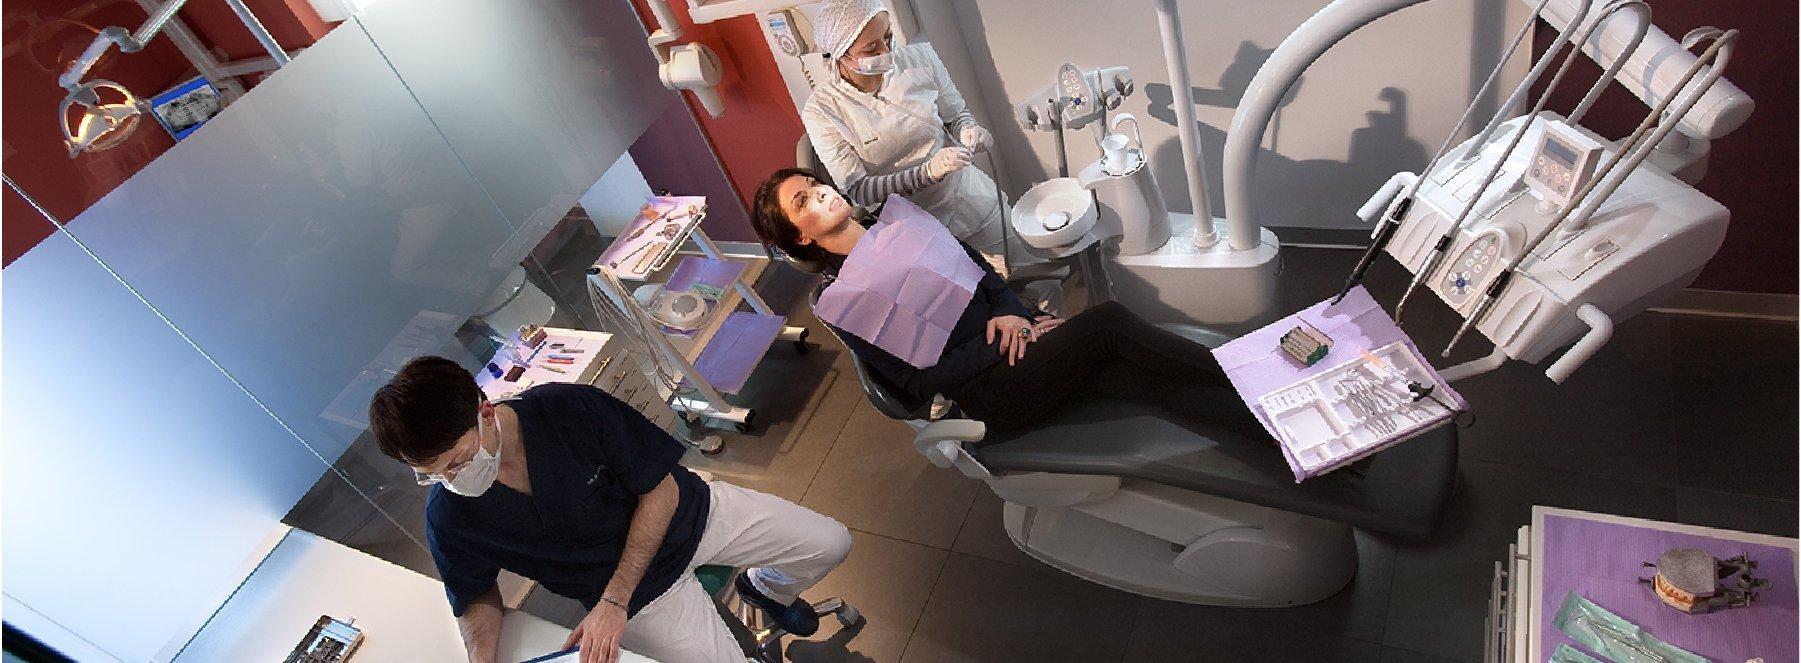 Prestazioni Dental Studio Invernizzi